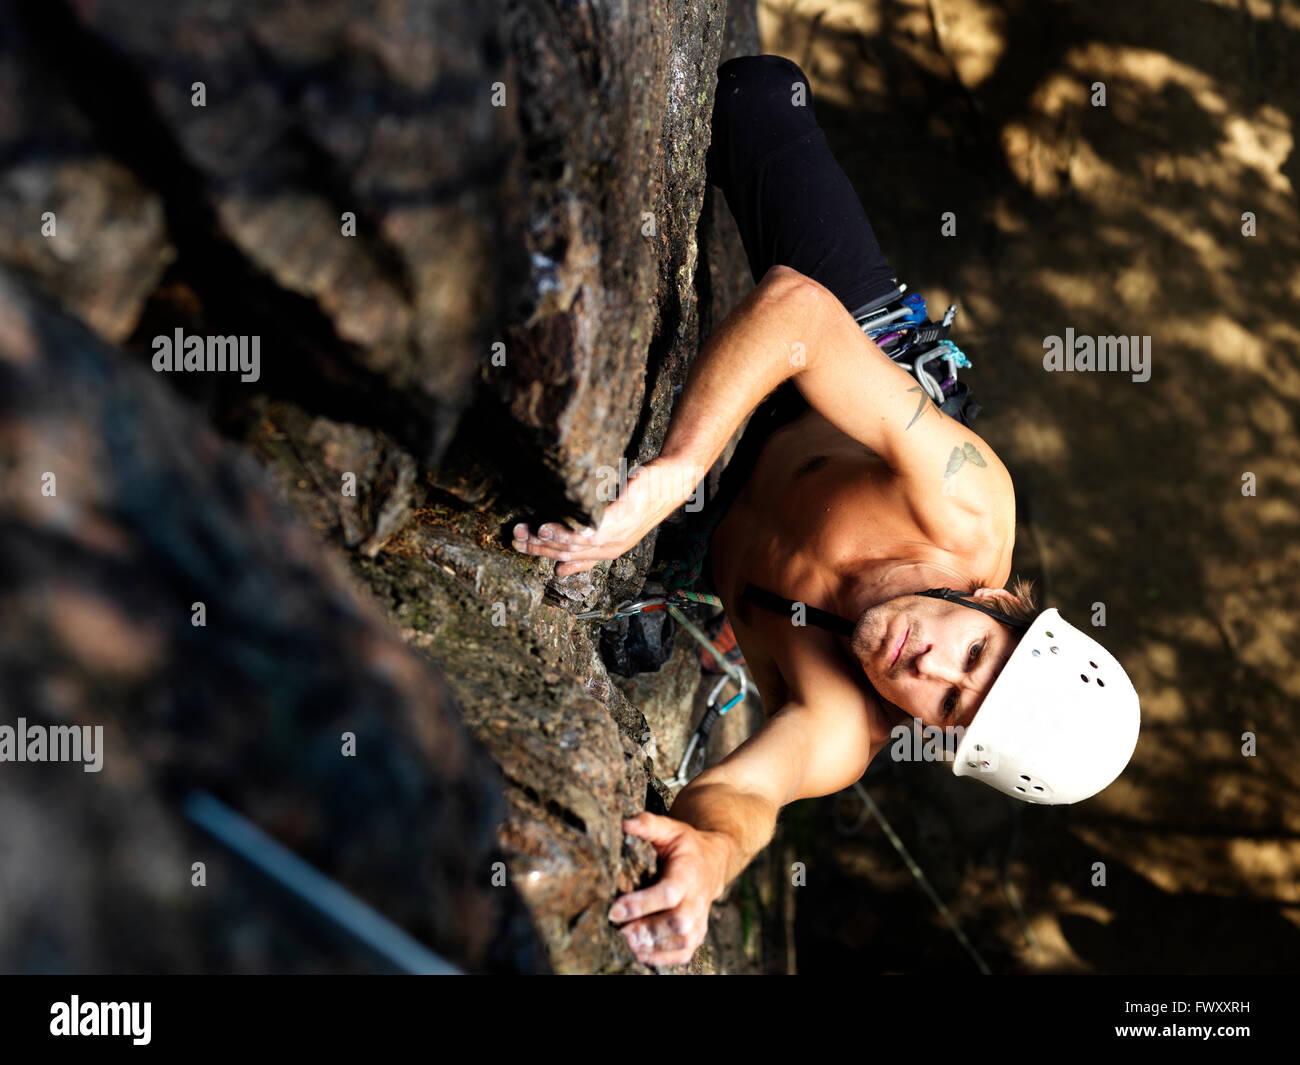 Sweden, Ostergotland, Agelsjon, Man climbing rock - Stock Image